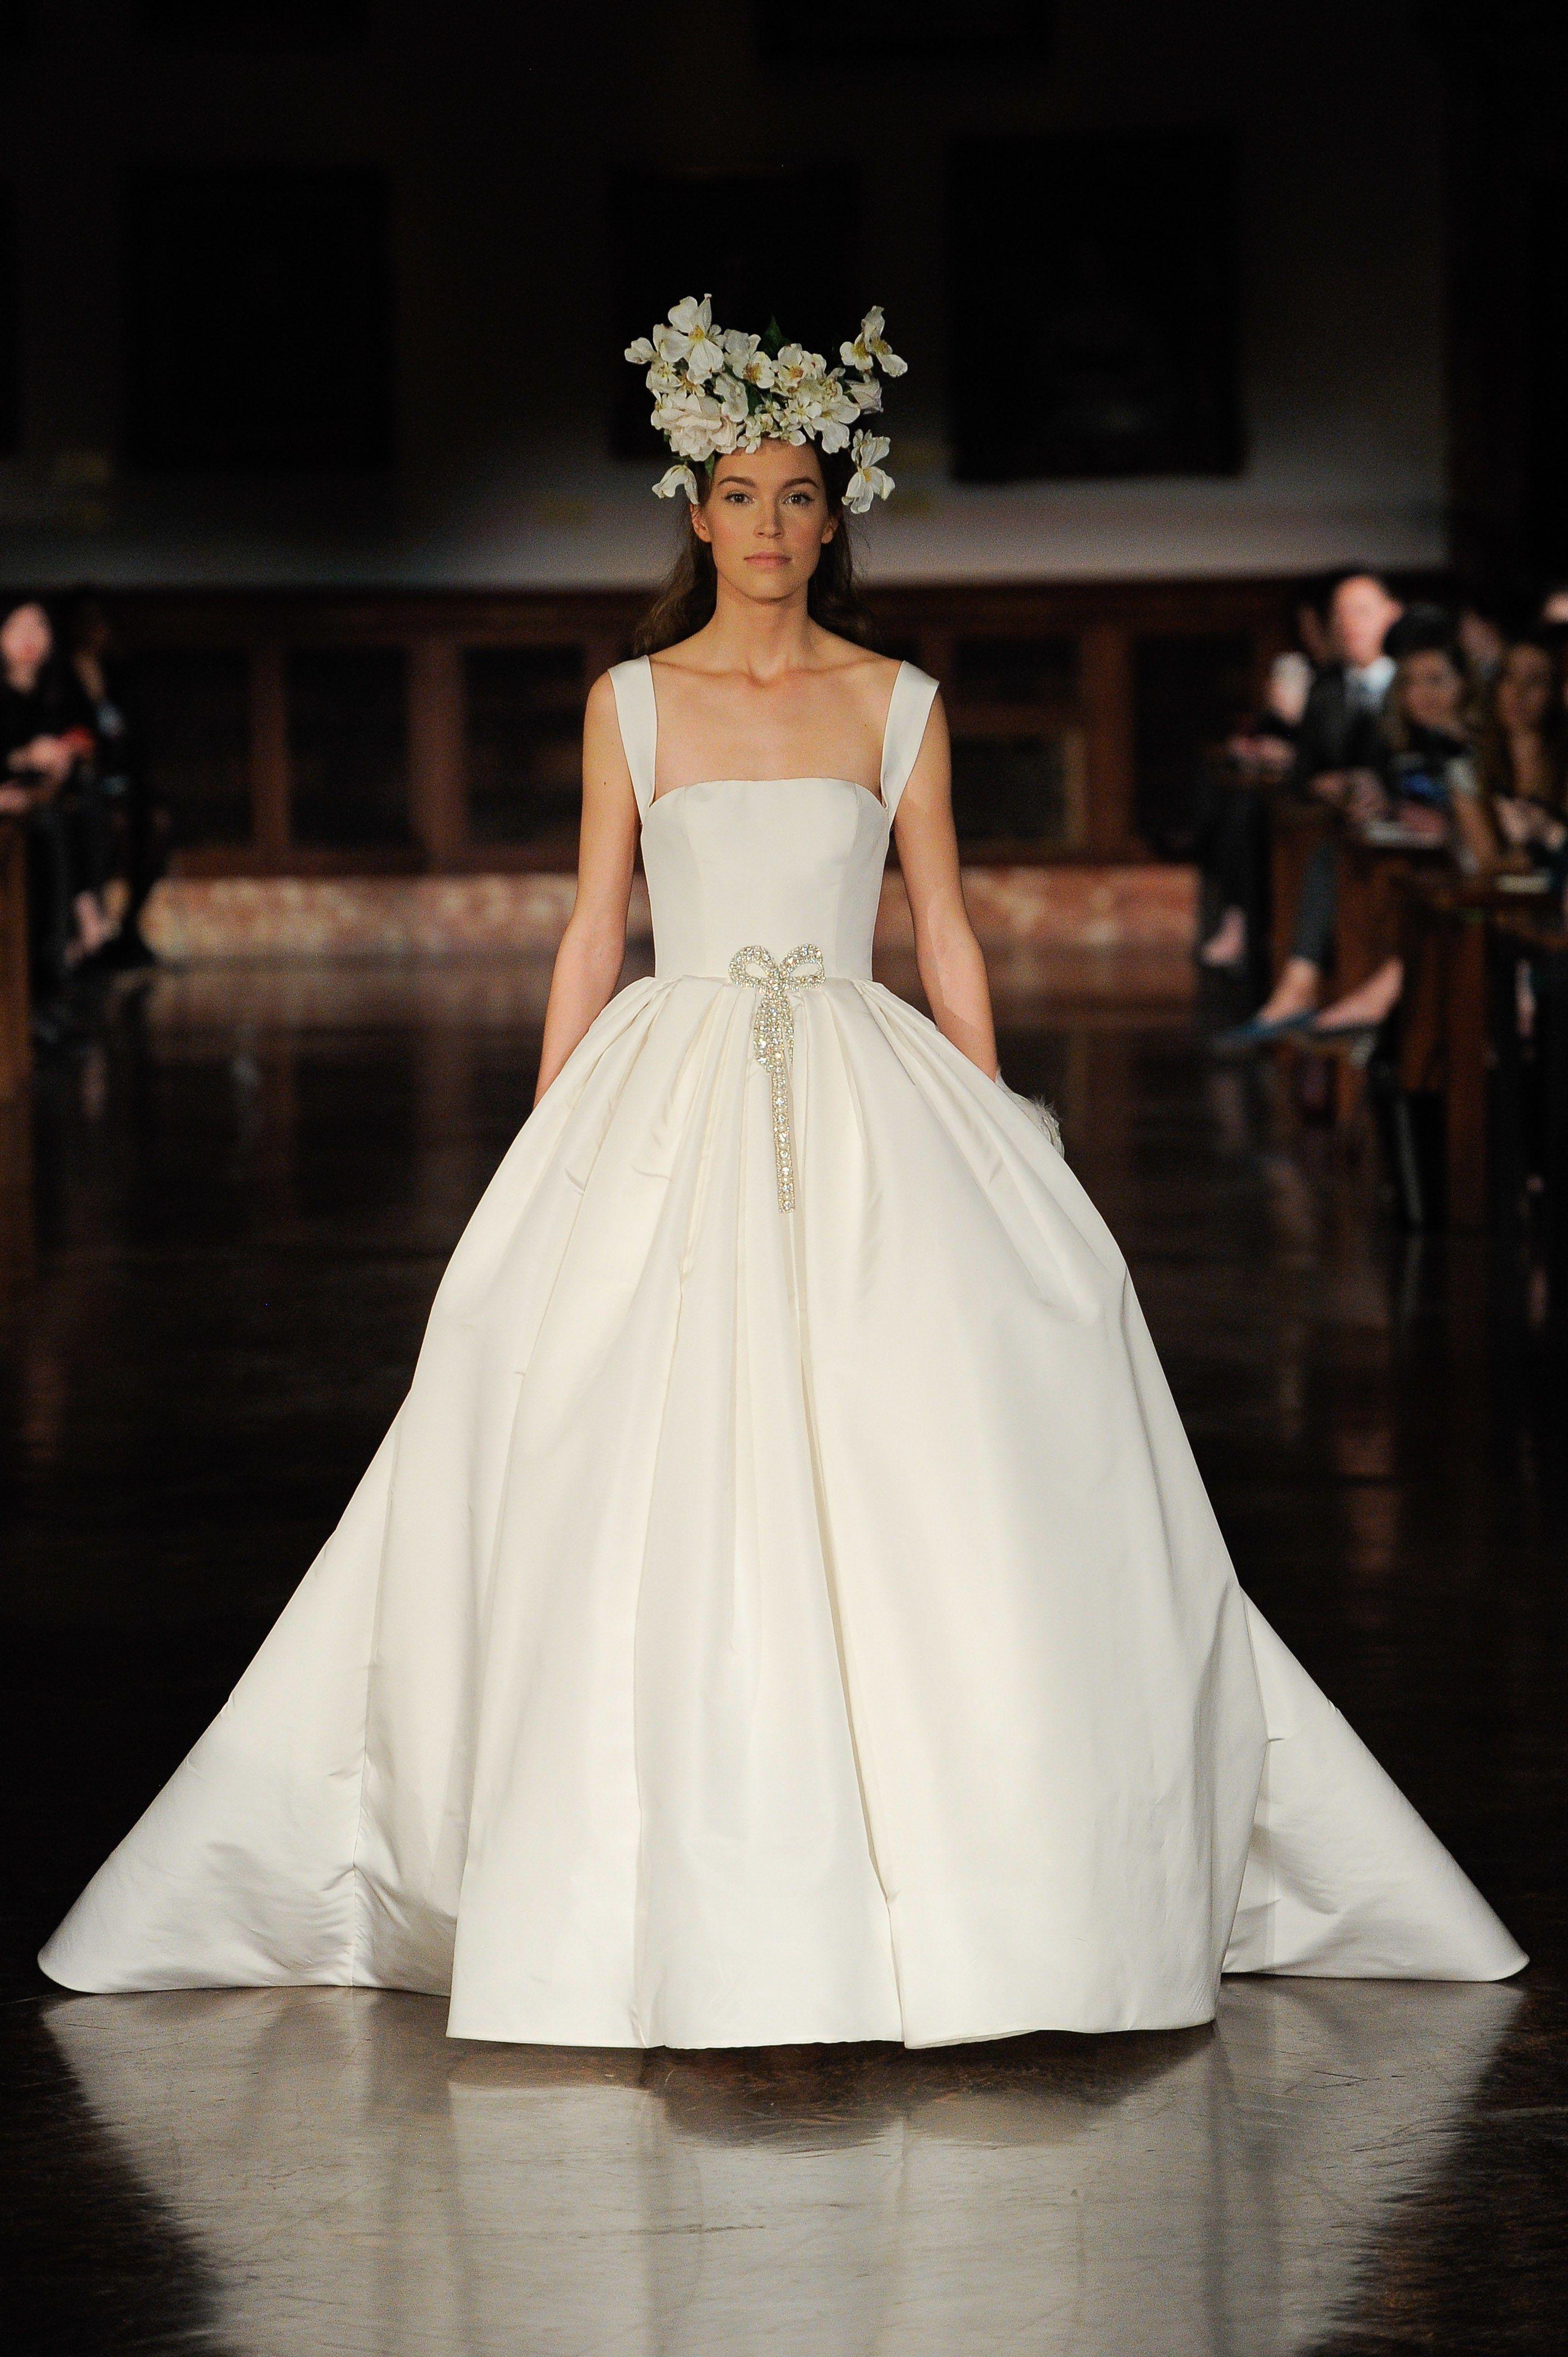 Reem Acra Bridal Spring 2019 Fashion Show Ball Gowns Wedding Ball Gown Wedding Dress Wedding Dresses Kleinfeld